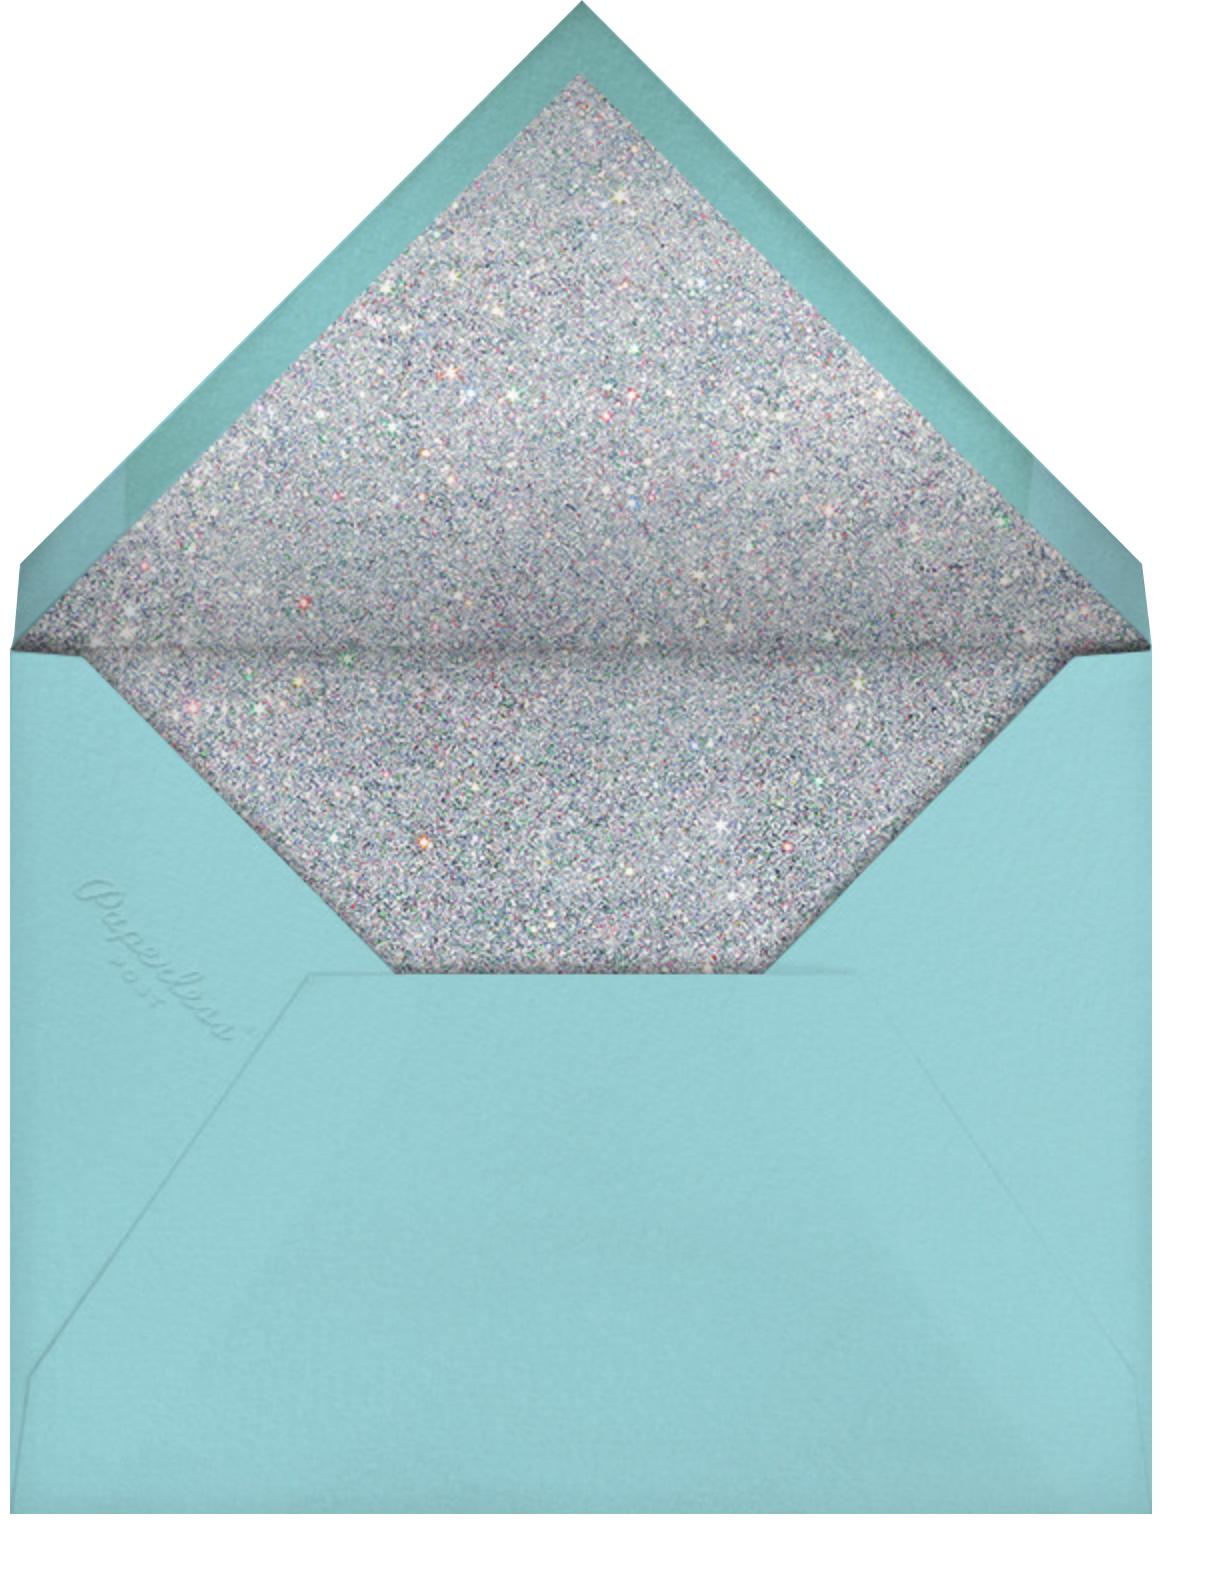 Glitter Glamour Photo - Paperless Post - Quinceañera - envelope back